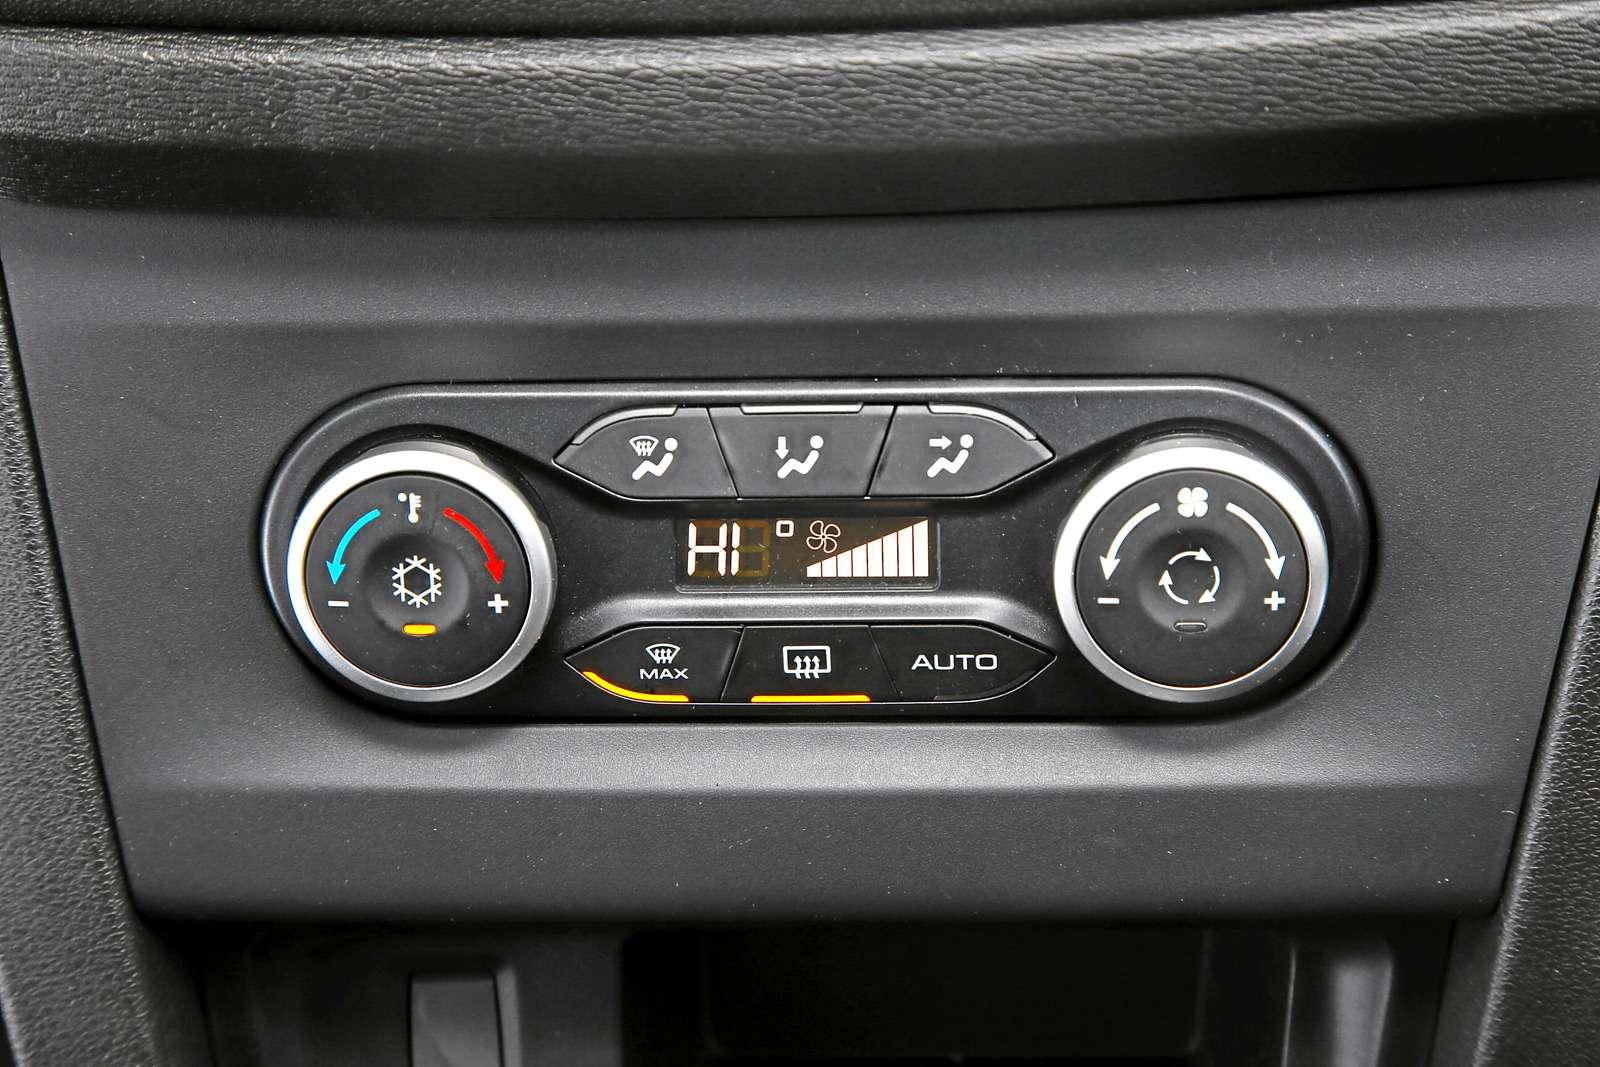 Большой зимний тест: Lada Vesta, Lada XRAY иDatsun mi-DO изпарка ЗР— фото 571431